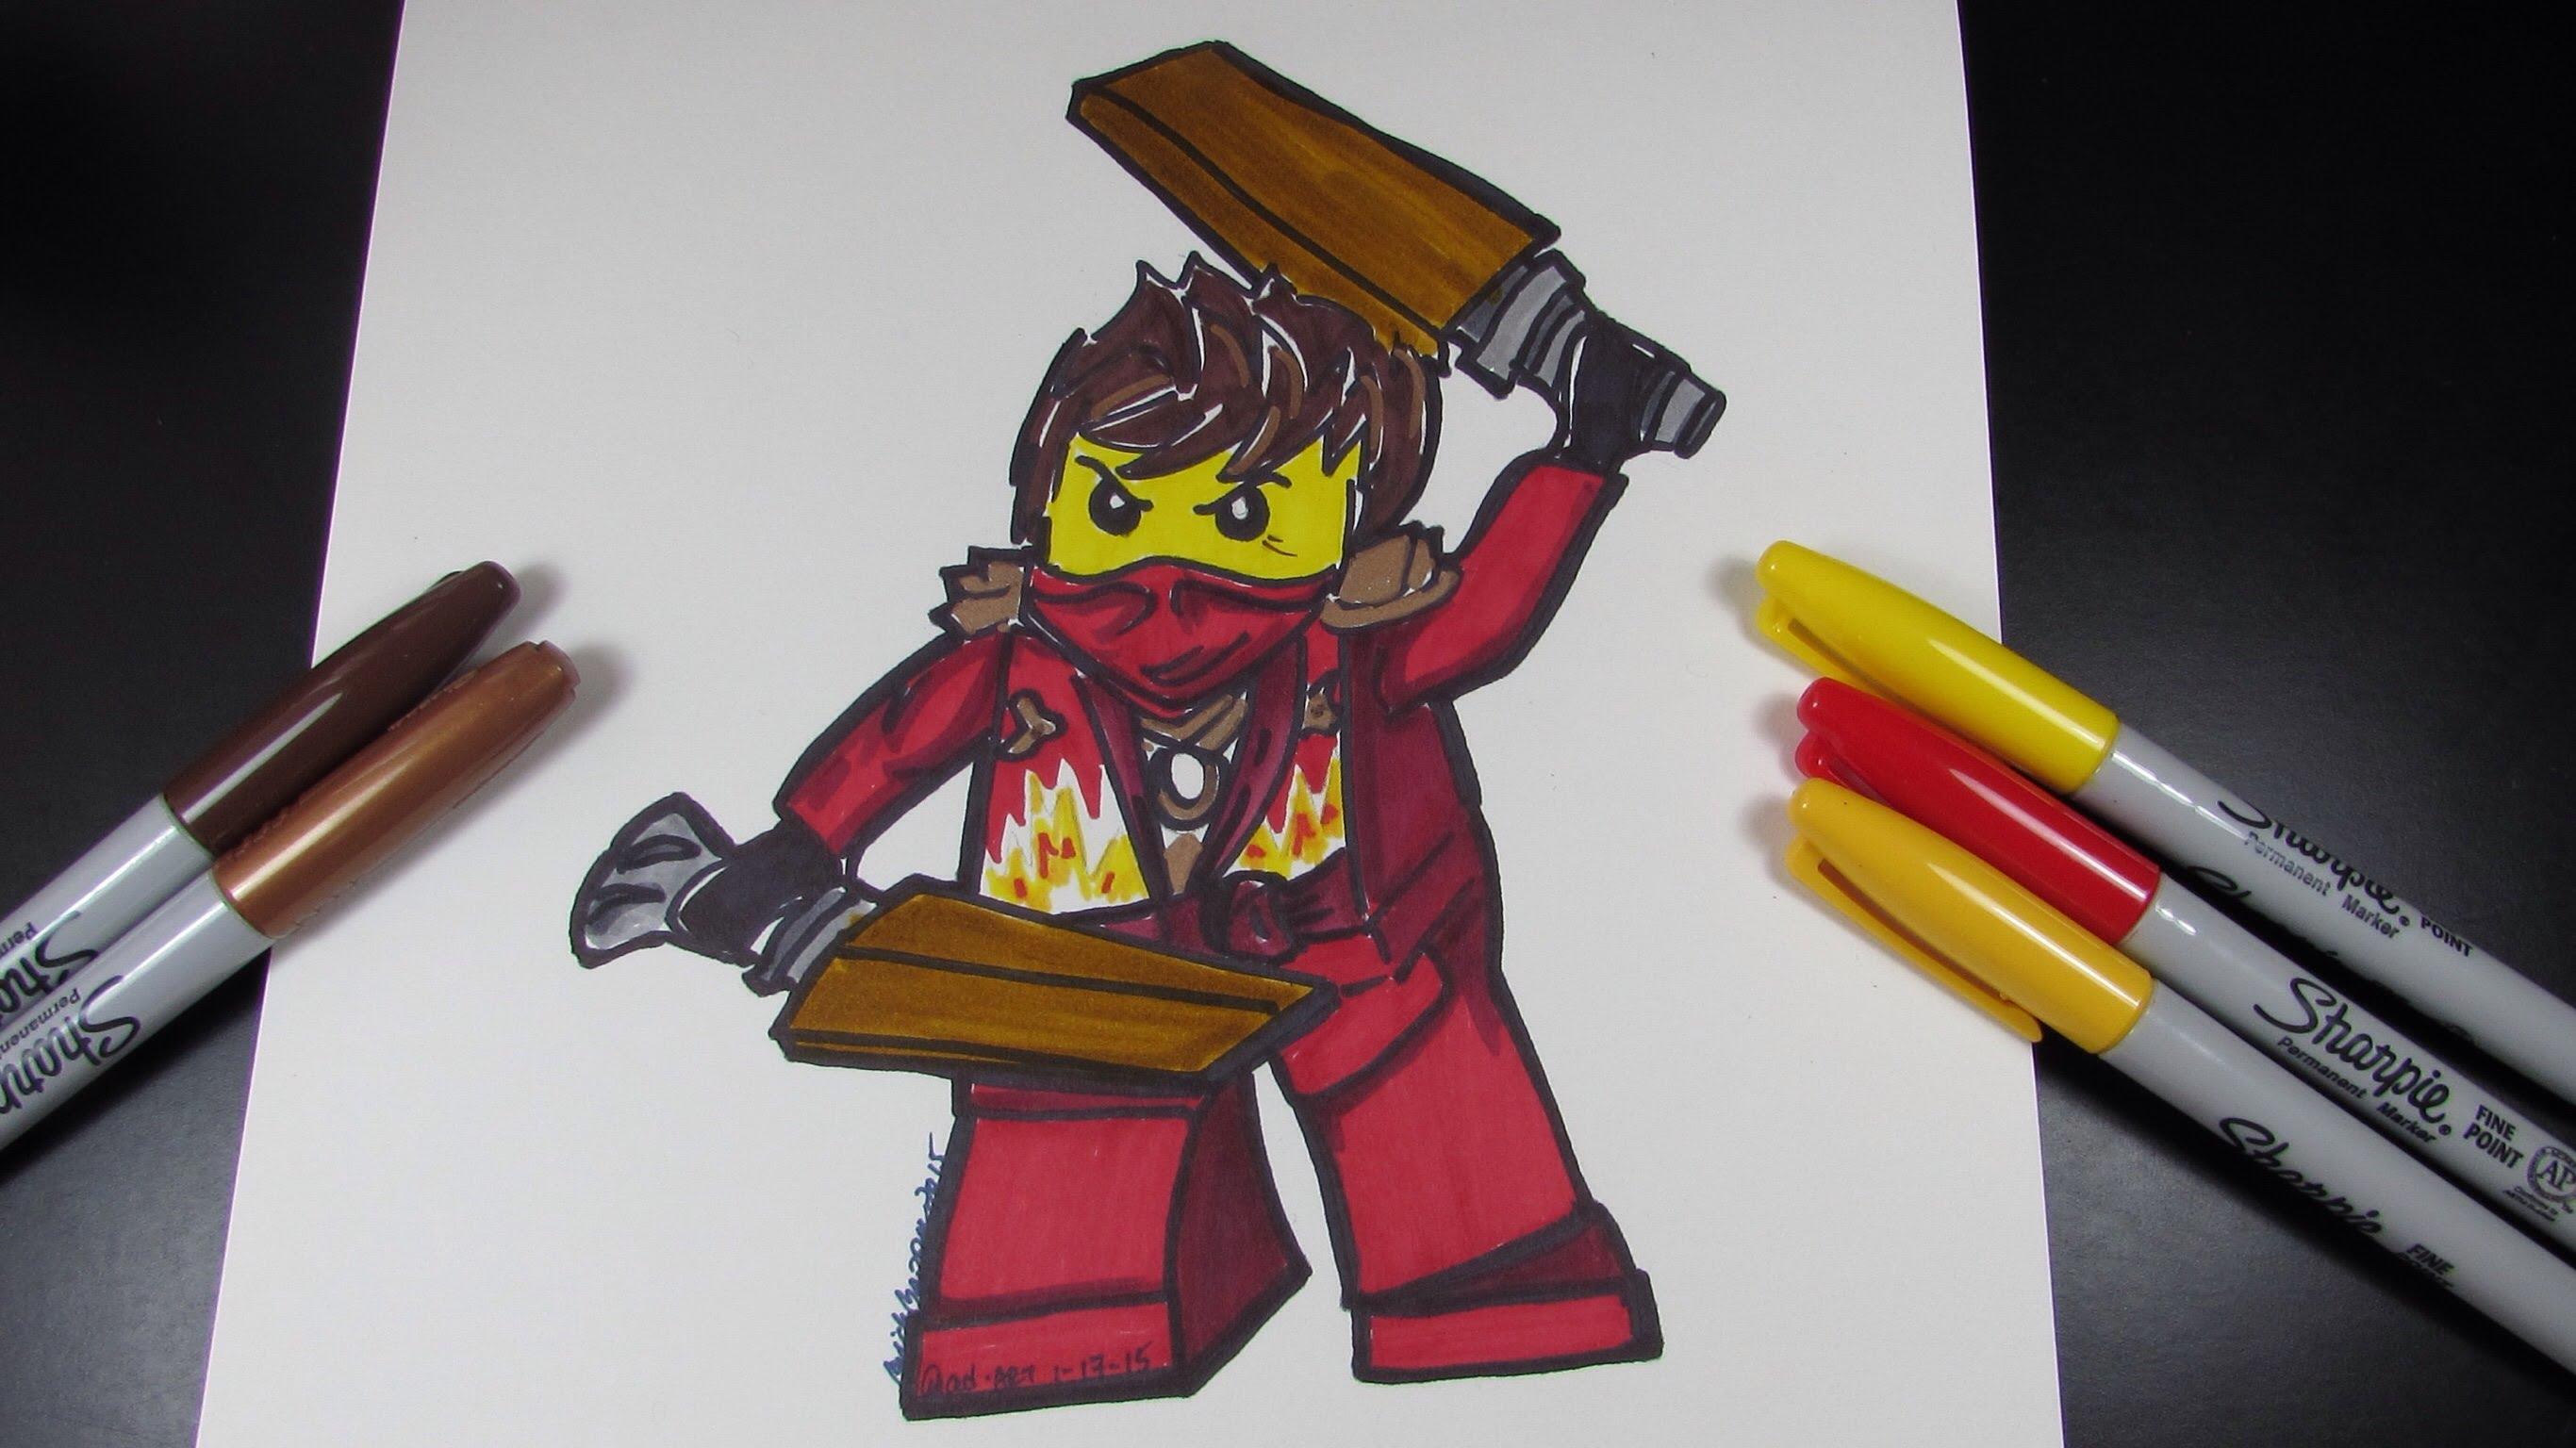 2732x1536 How To Draw Ninjago Kai The Red Ninja